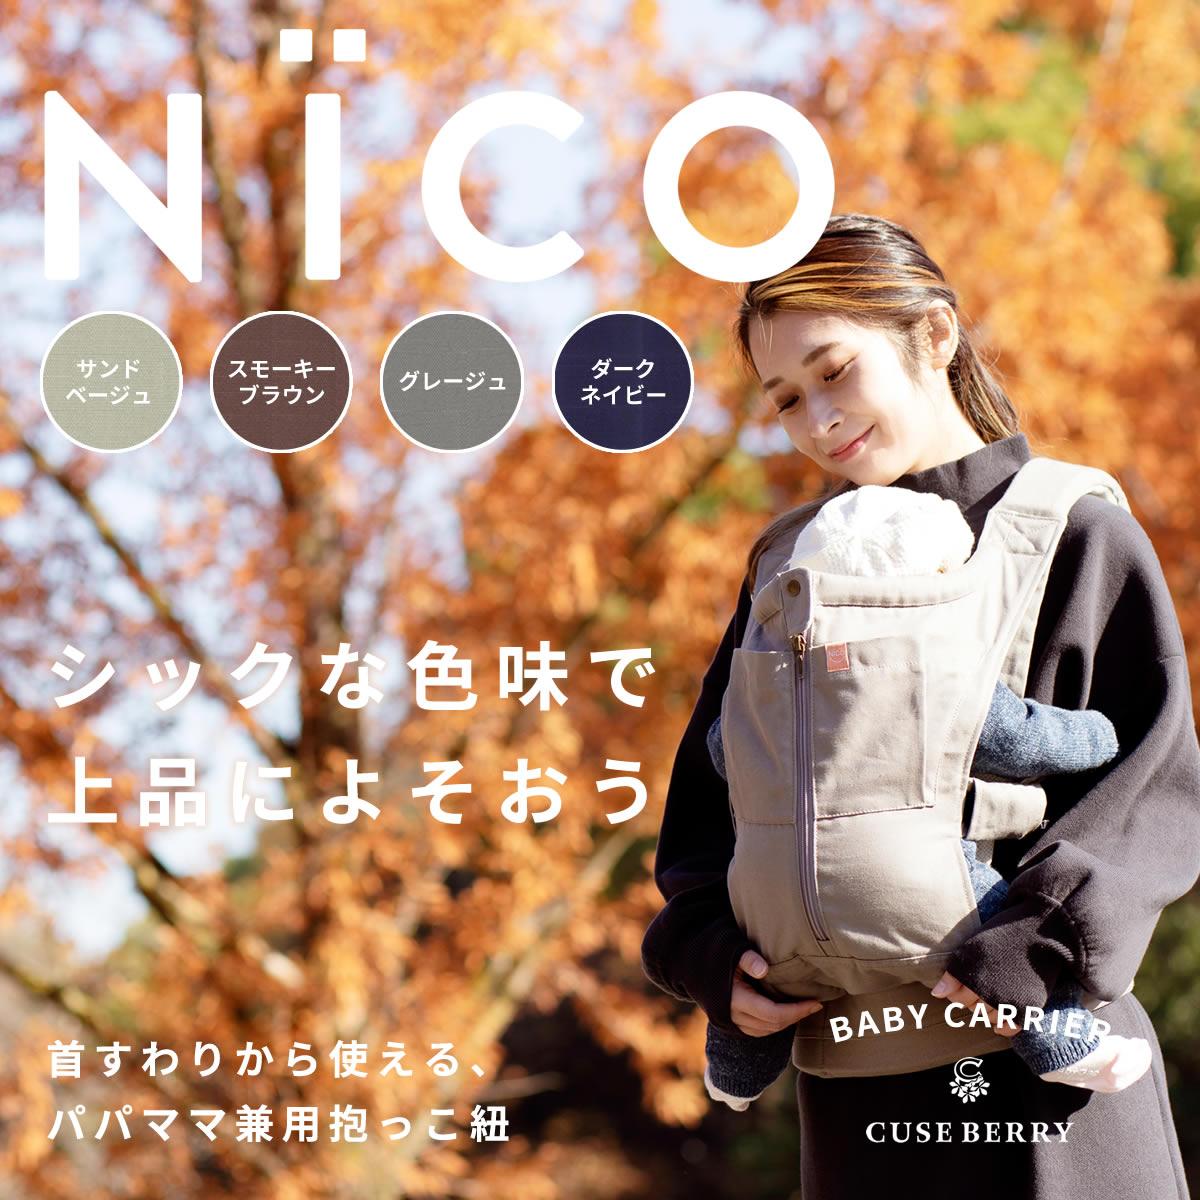 NICO - 首座り(約3ヵ月)から3歳まで使用可 4月28日ネイビー販売